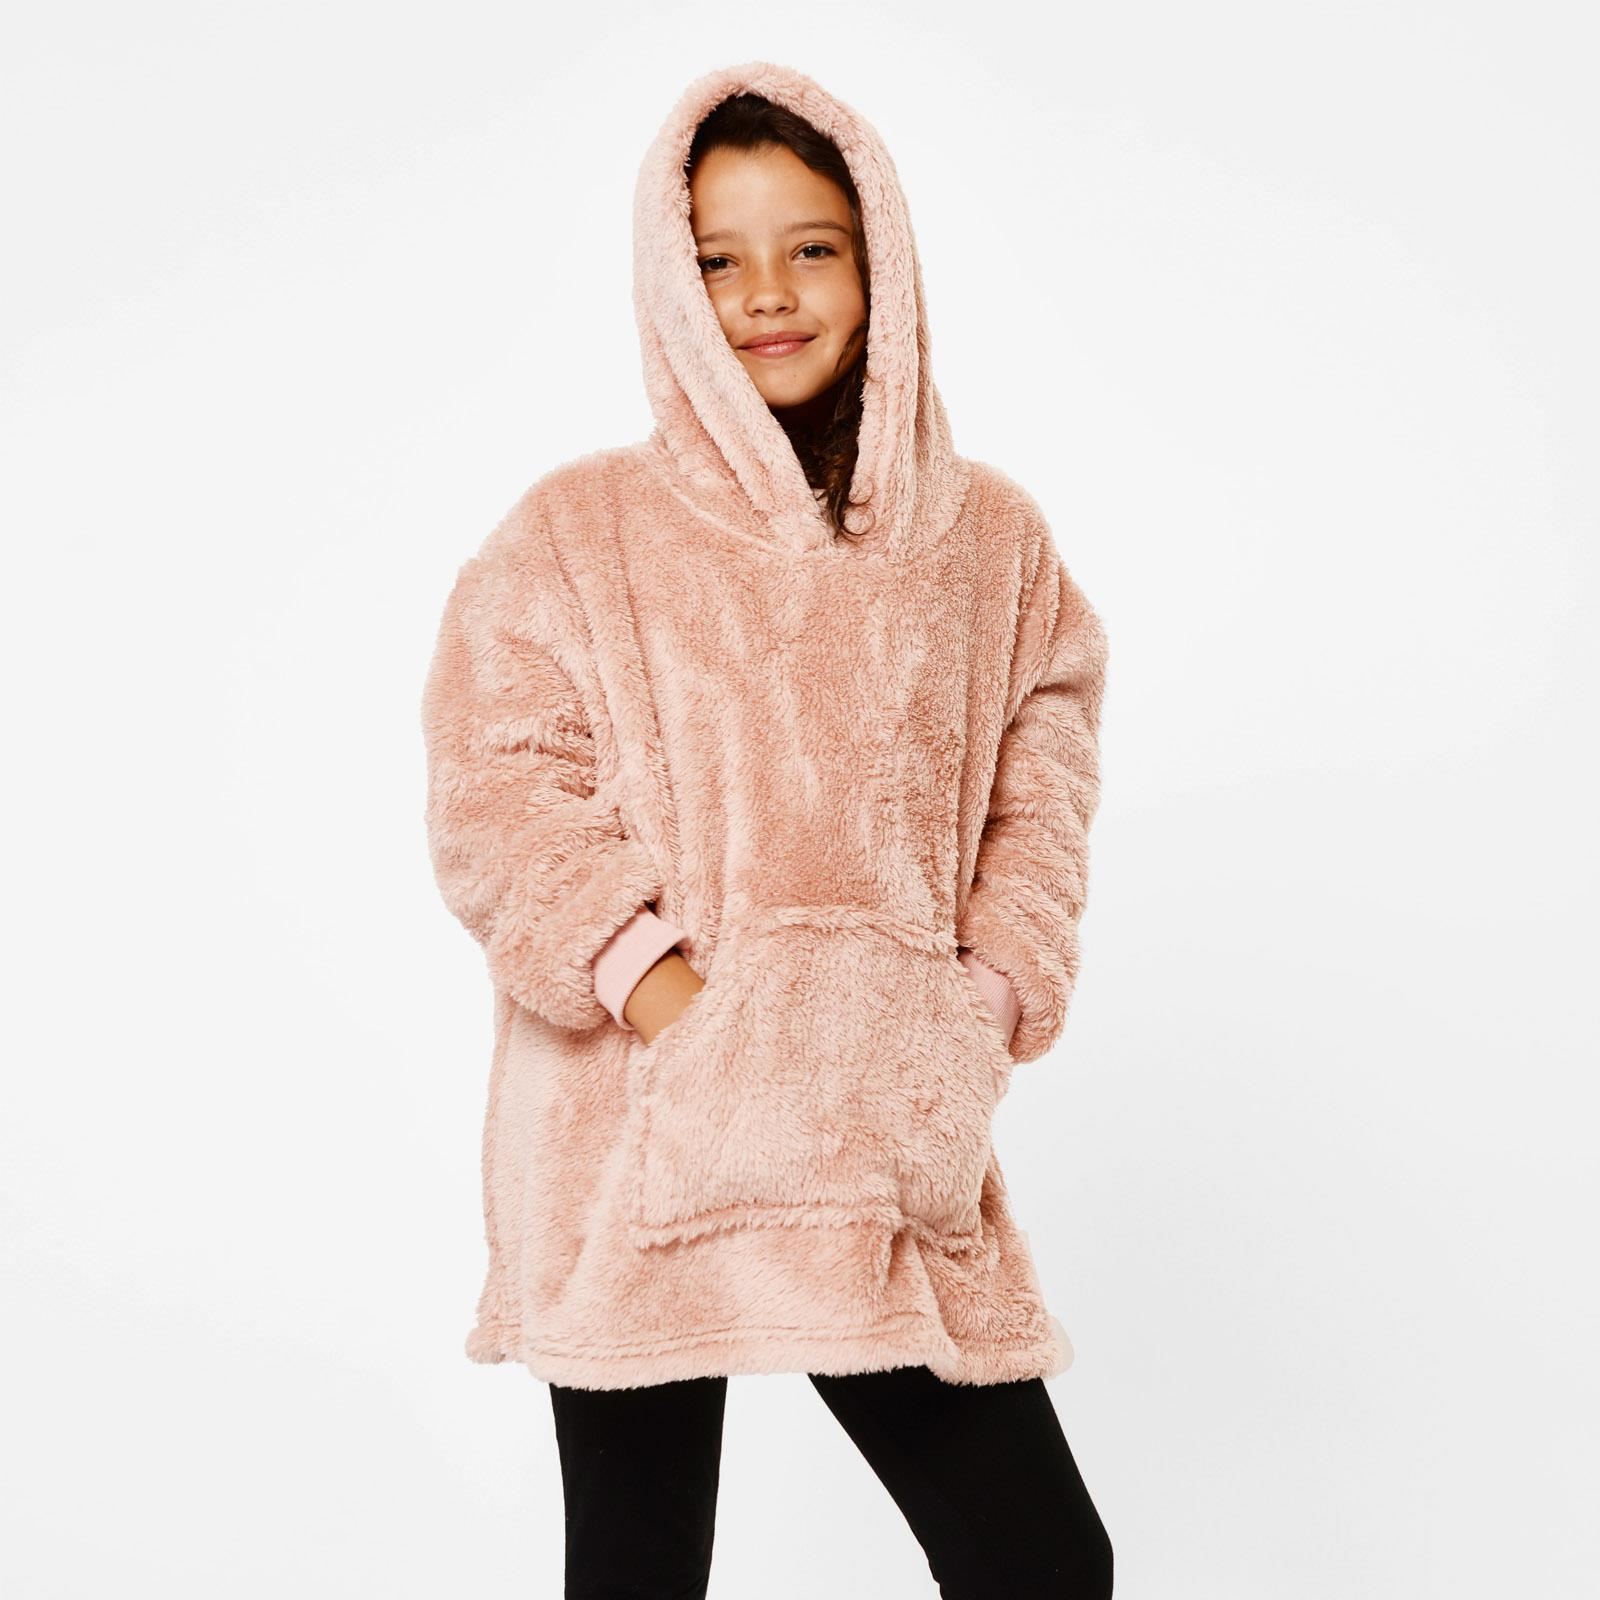 thumbnail 13 - Brentfords-Teddy-Fleece-Hoodie-Blanket-Oversized-Giant-Wearable-Adults-Kids-UK